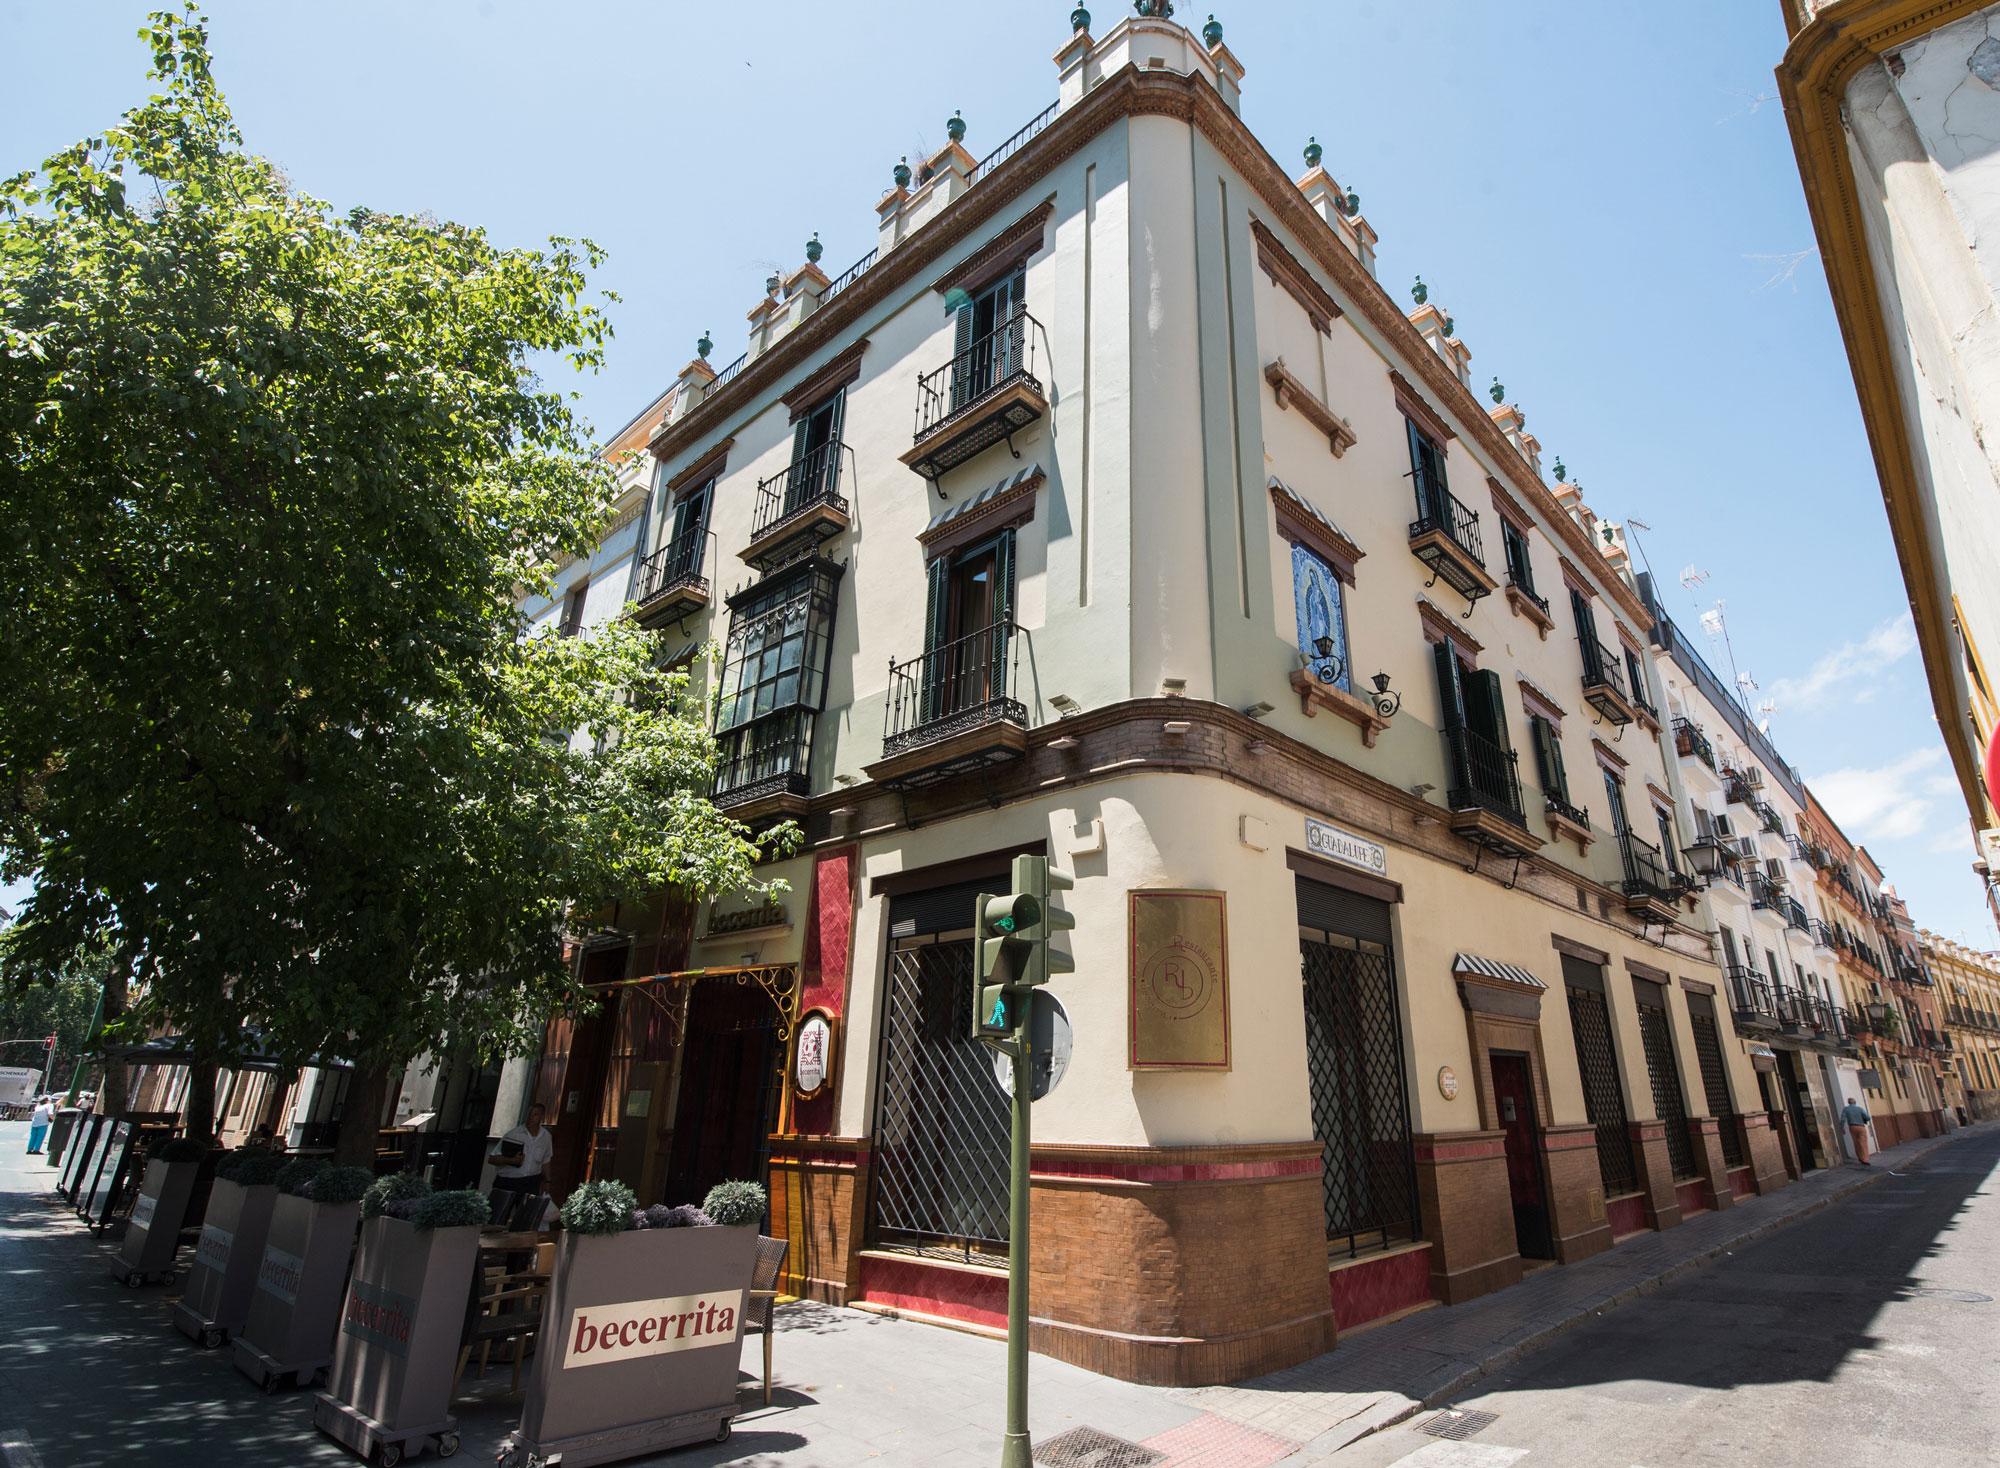 restaurante becerrita sevilla fachada